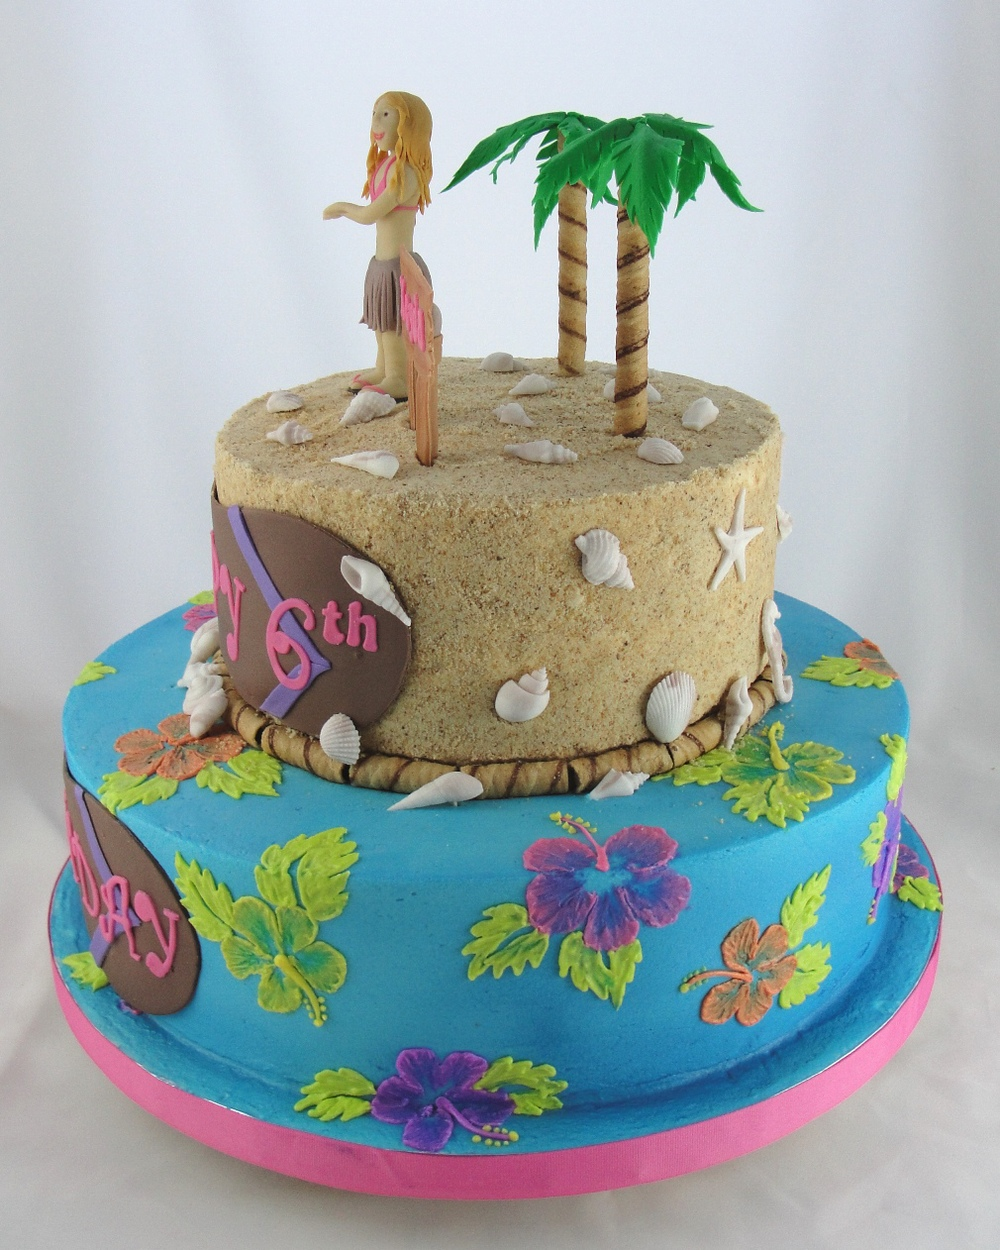 LBC 1321 - Hawaiian Luau Cake 2.jpg